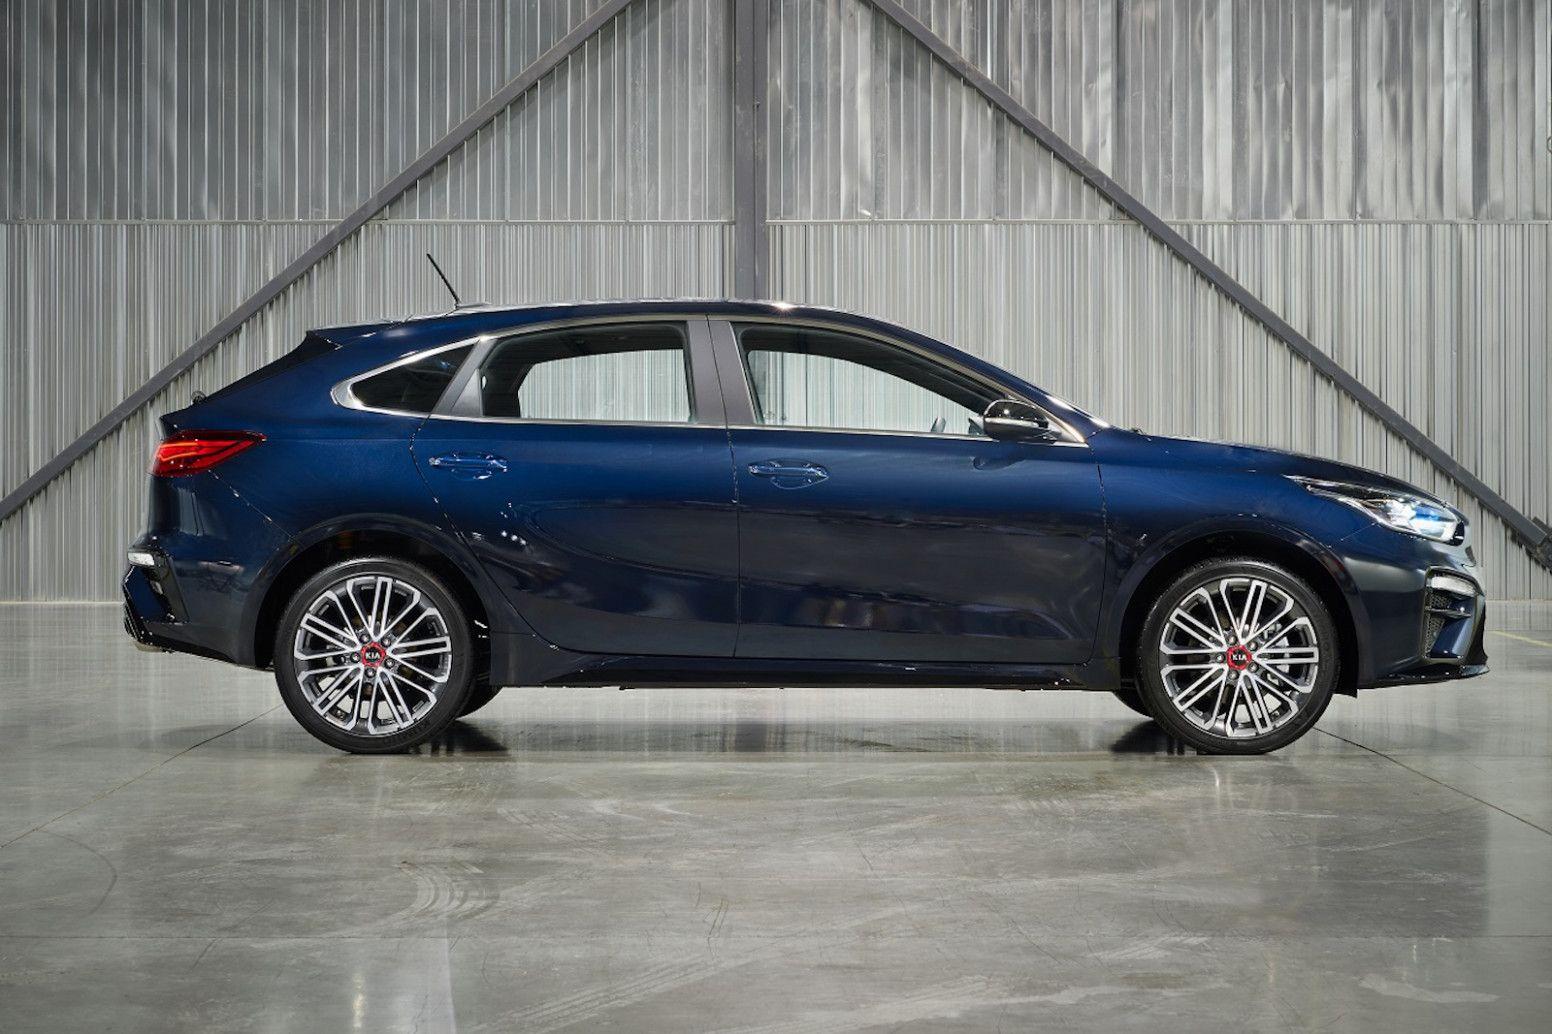 11 Picture 2020 Kia Forte Hatchback In 2020 Kia Forte Kia Hatchback